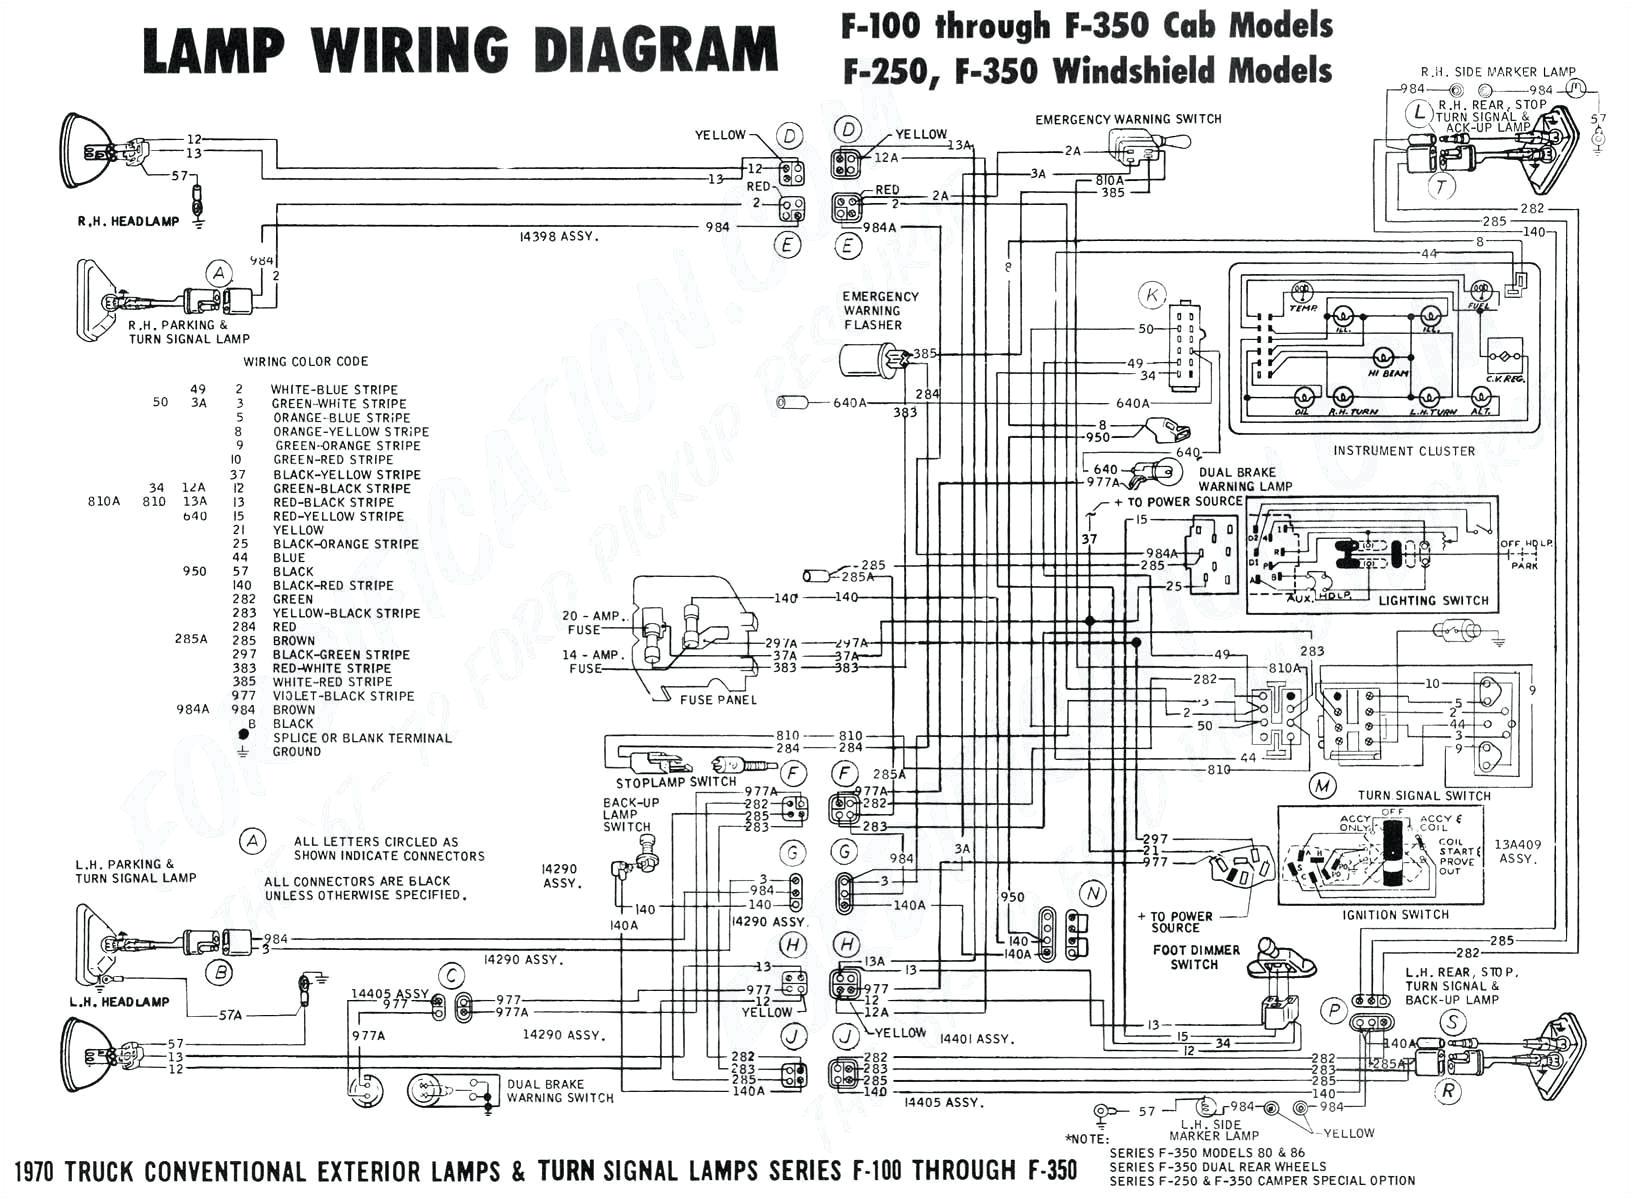 12v Generator Wiring Diagram Generator Stator Wiring Diagram Free Download Wiring Diagram Host